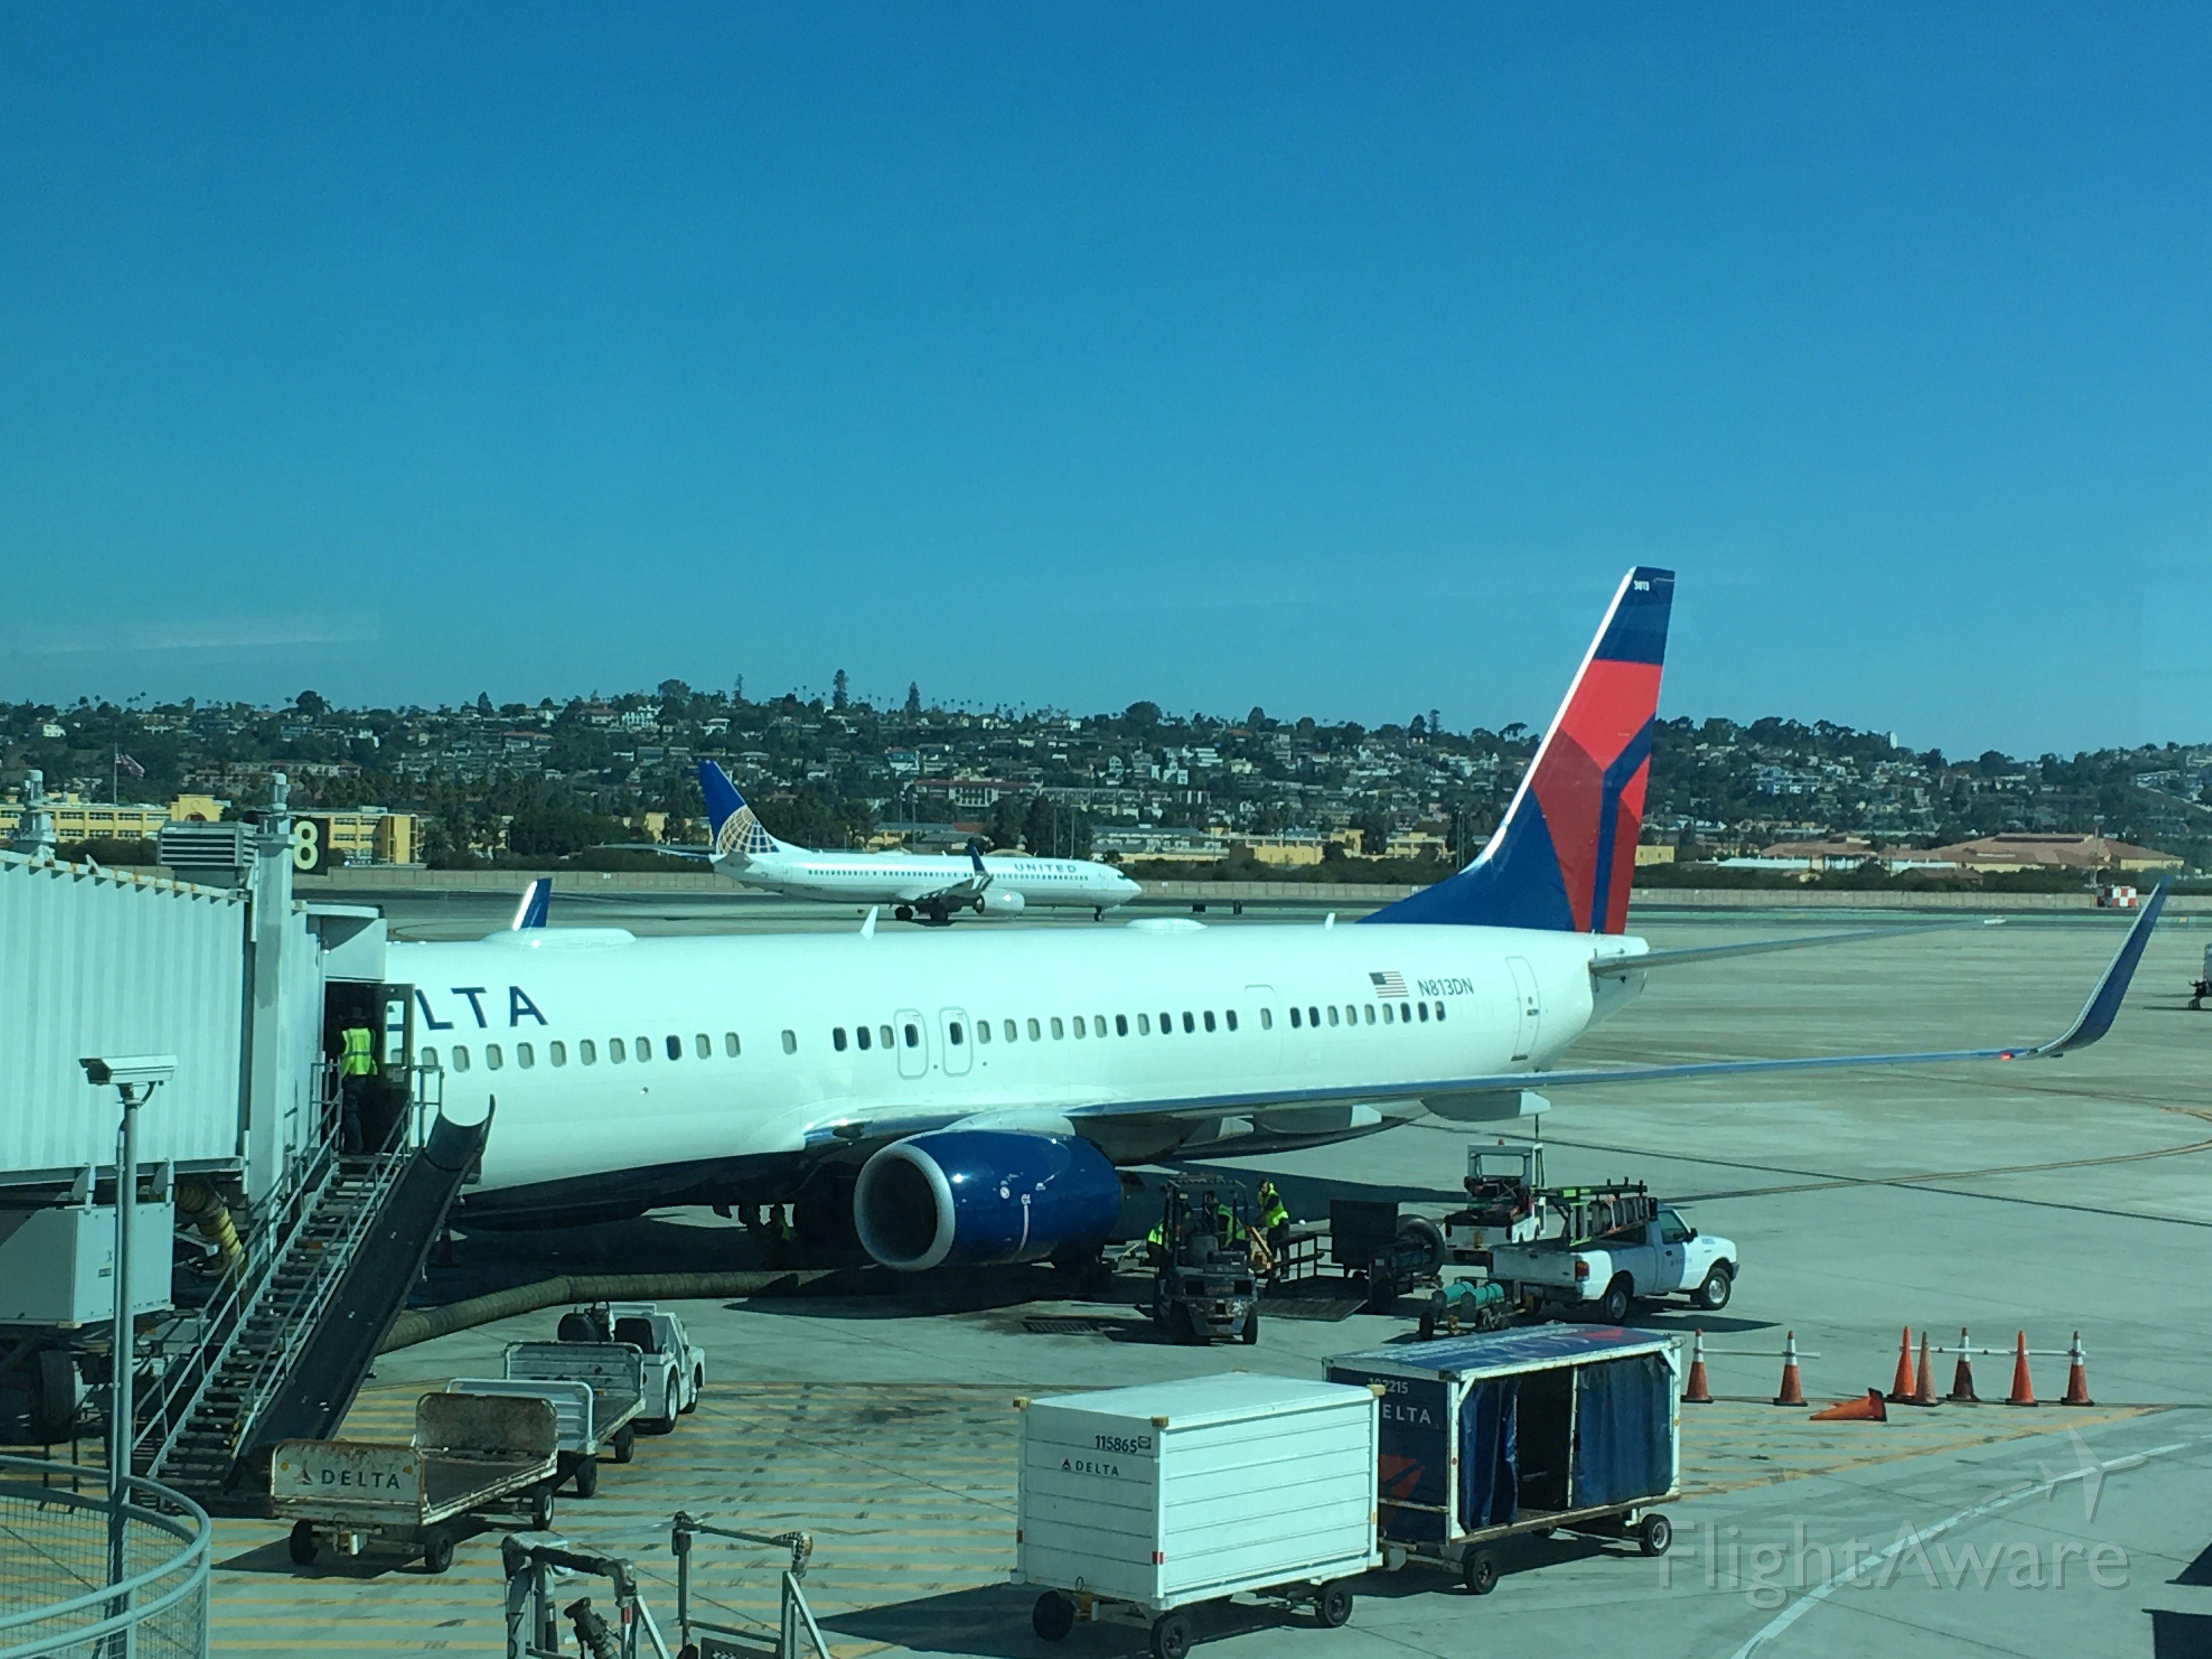 Boeing 737-900 (N813DN) - DAL1851 to Detroit